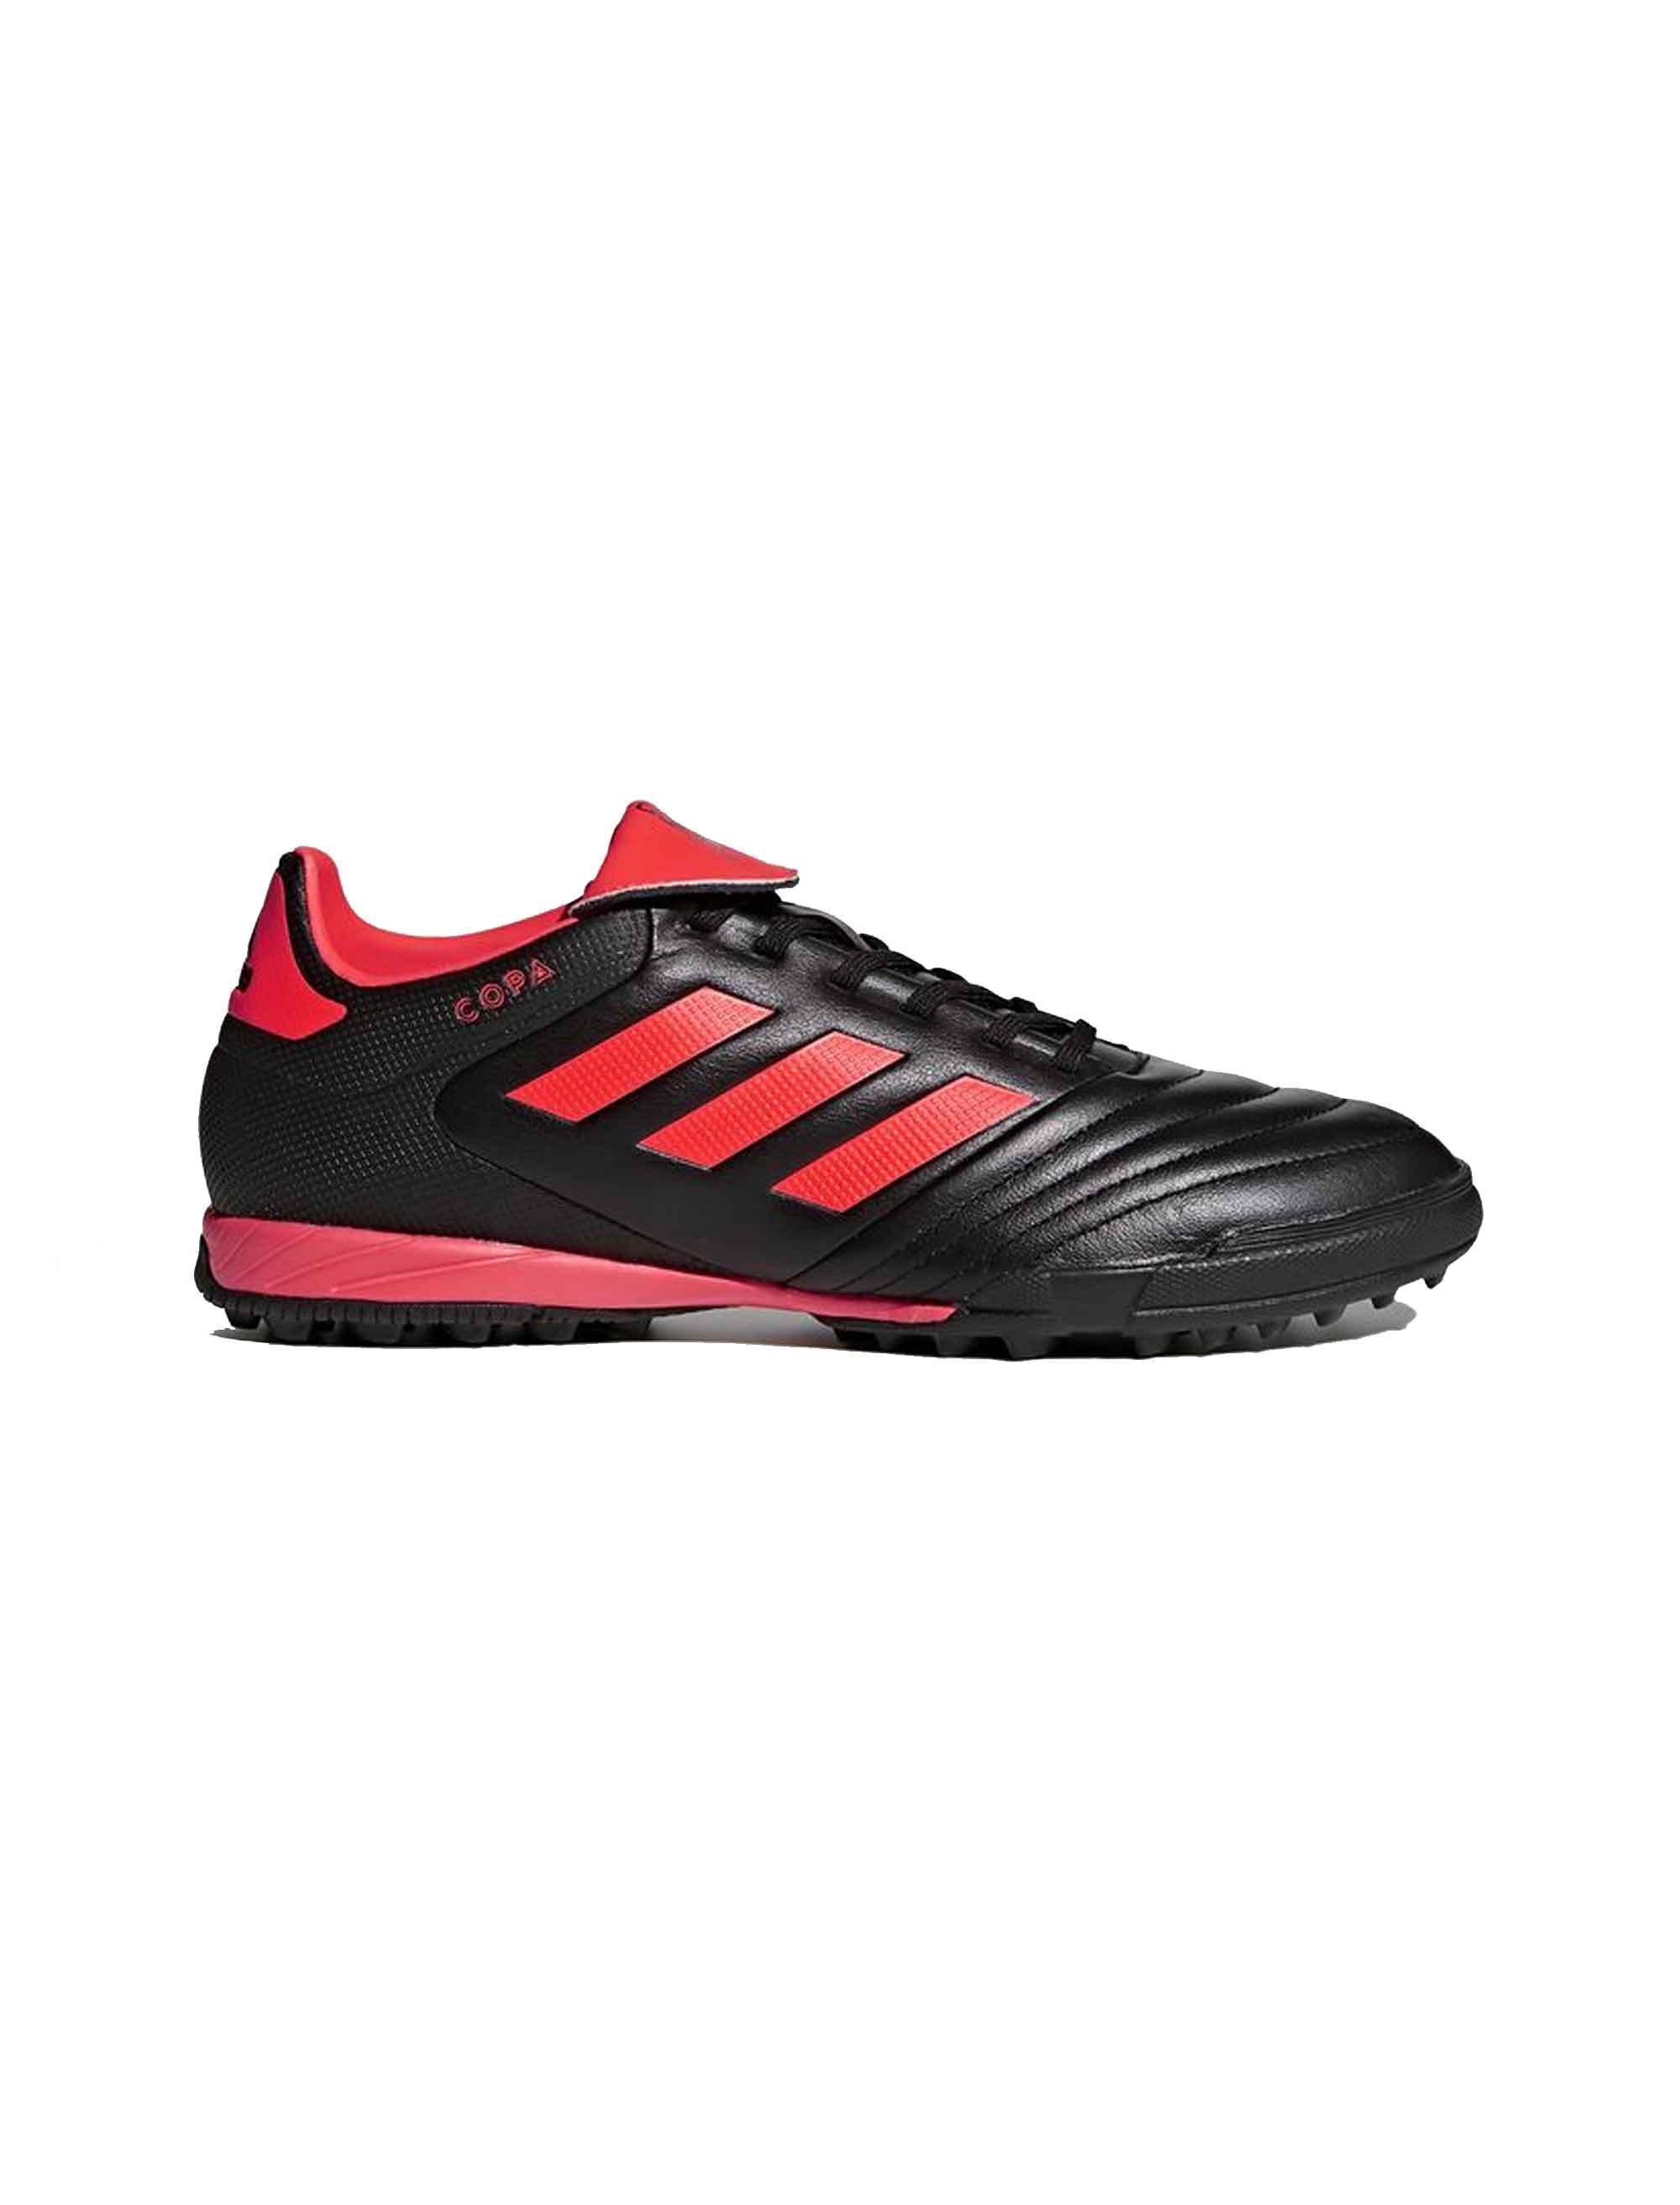 کفش فوتبال مردانه آیداس مدل Copa Tango 17-3 Turf - آدیداس